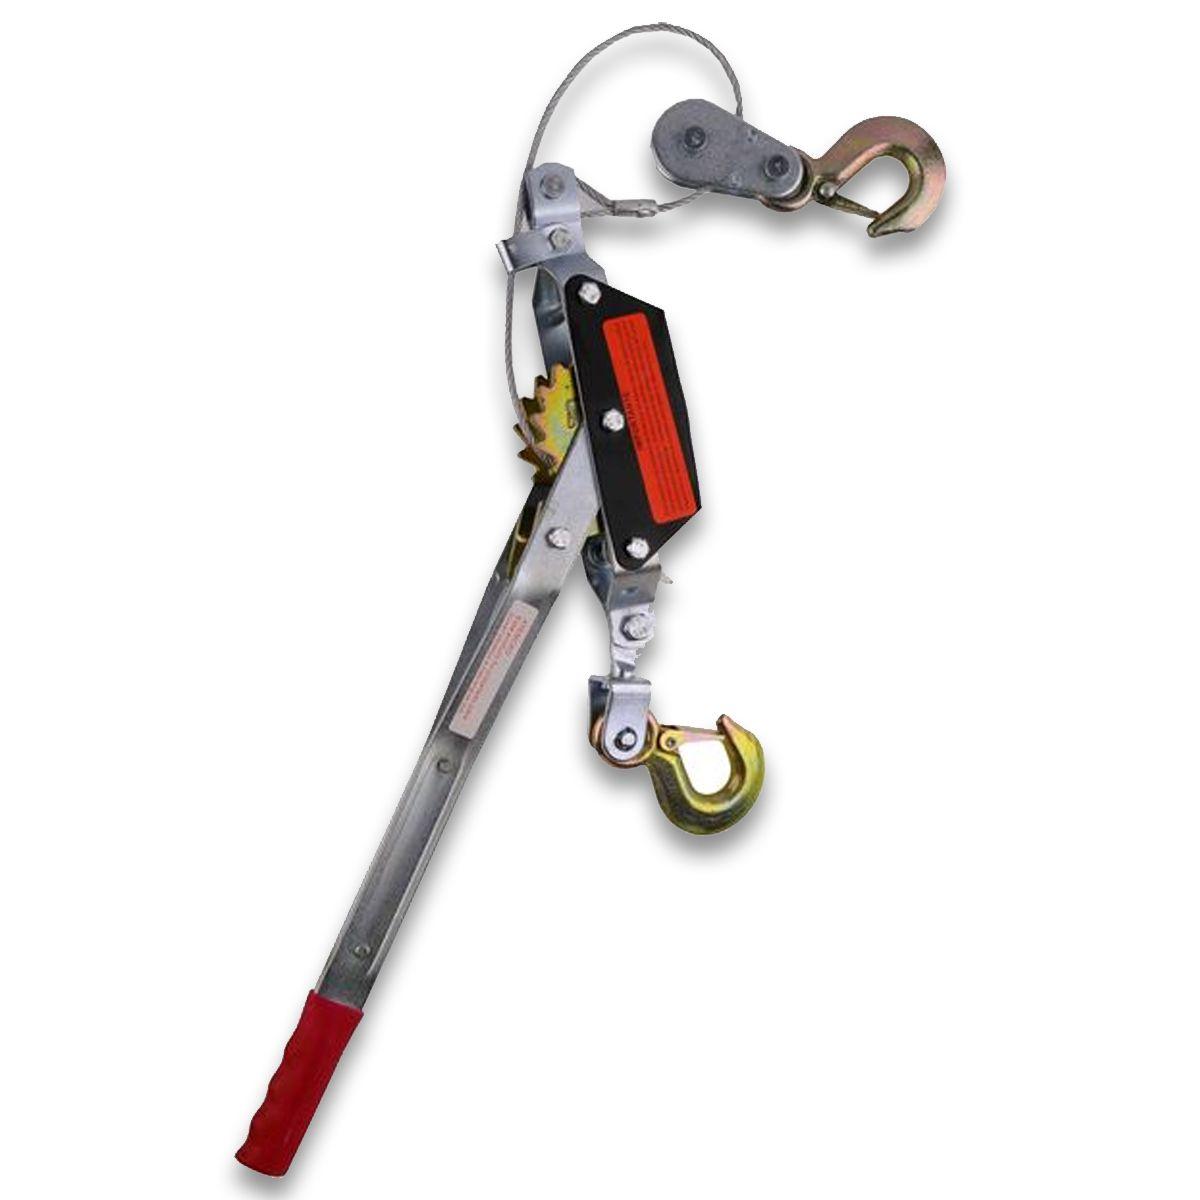 Kit Mini Guincho 4t P/puxar Supender + Cinta Catraca Manual